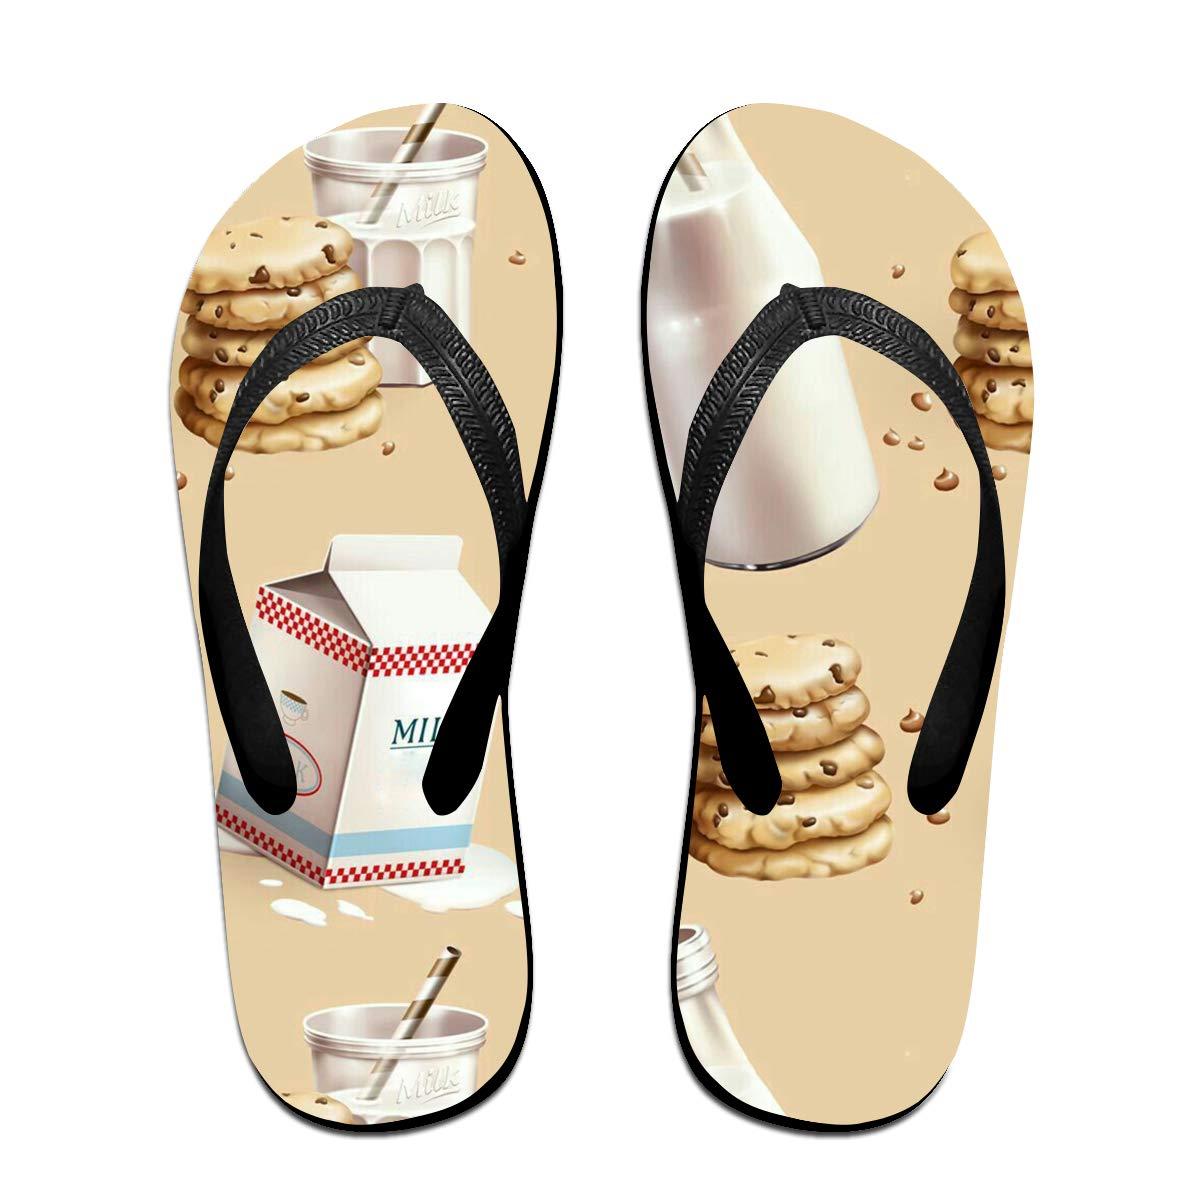 Couple Slipper Milk Cookies Pattern Print Flip Flops Unisex Chic Sandals Rubber Non-Slip Spa Thong Slippers